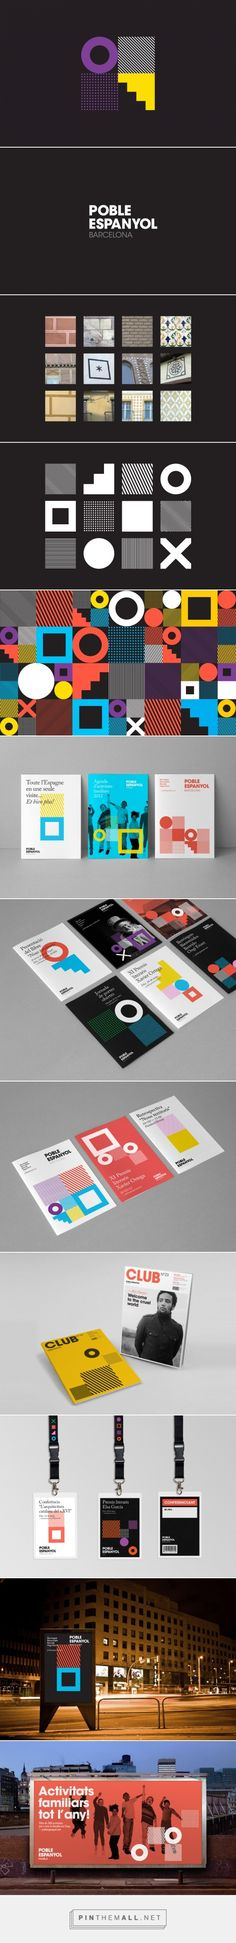 Poble Espanyol / Atipus   AA13 – blog – Inspiration – Design – Architecture – Photographie – Art - created via https://pinthemall.net